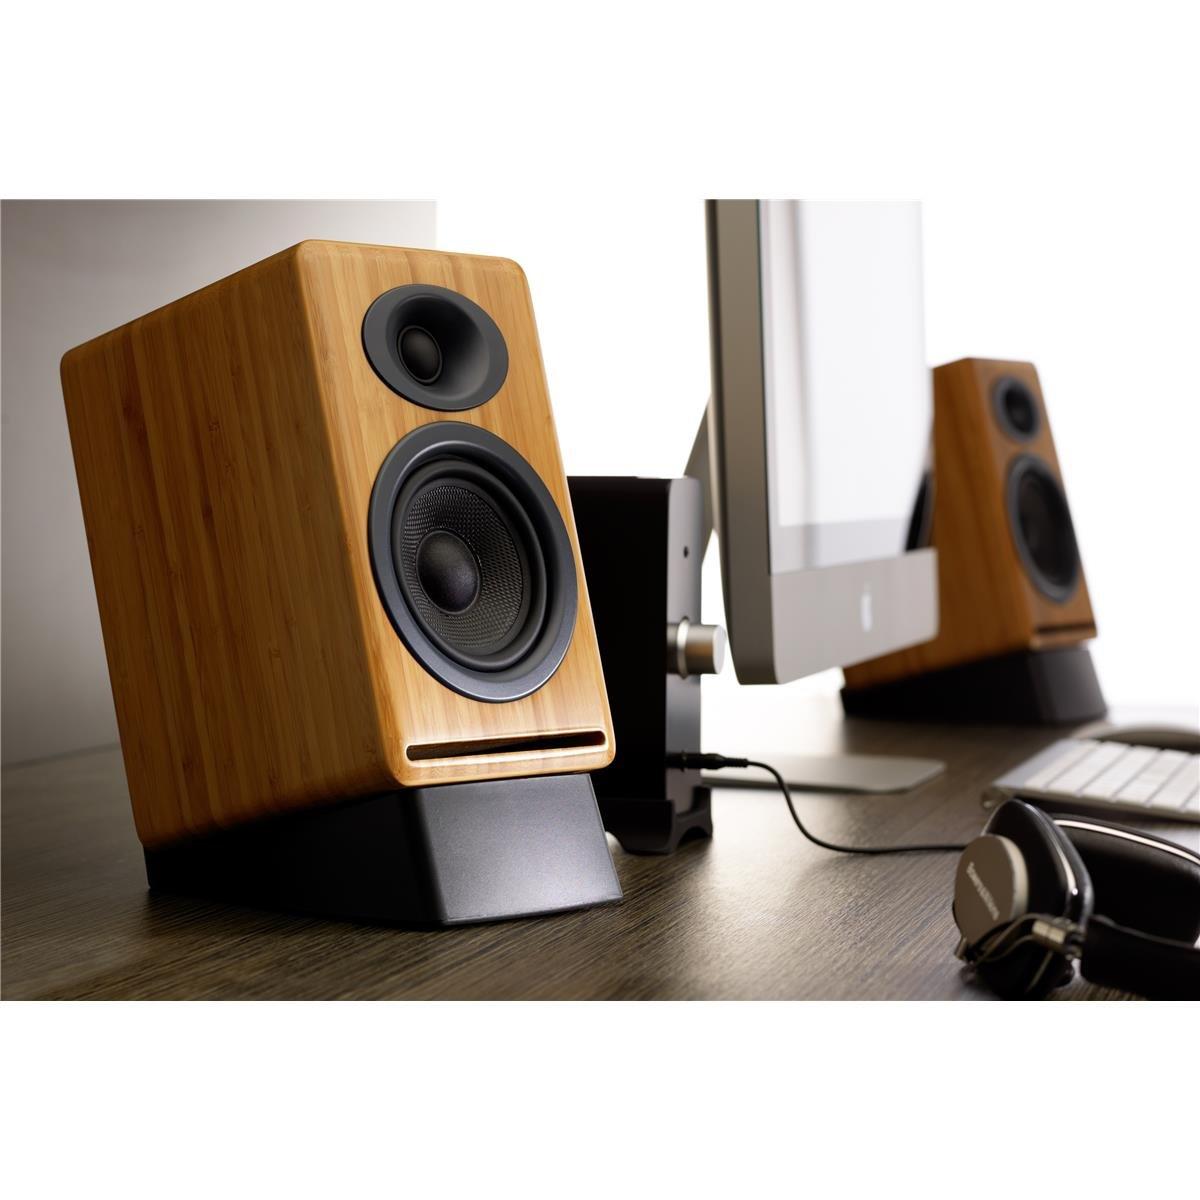 speakers desk. speakers desk l